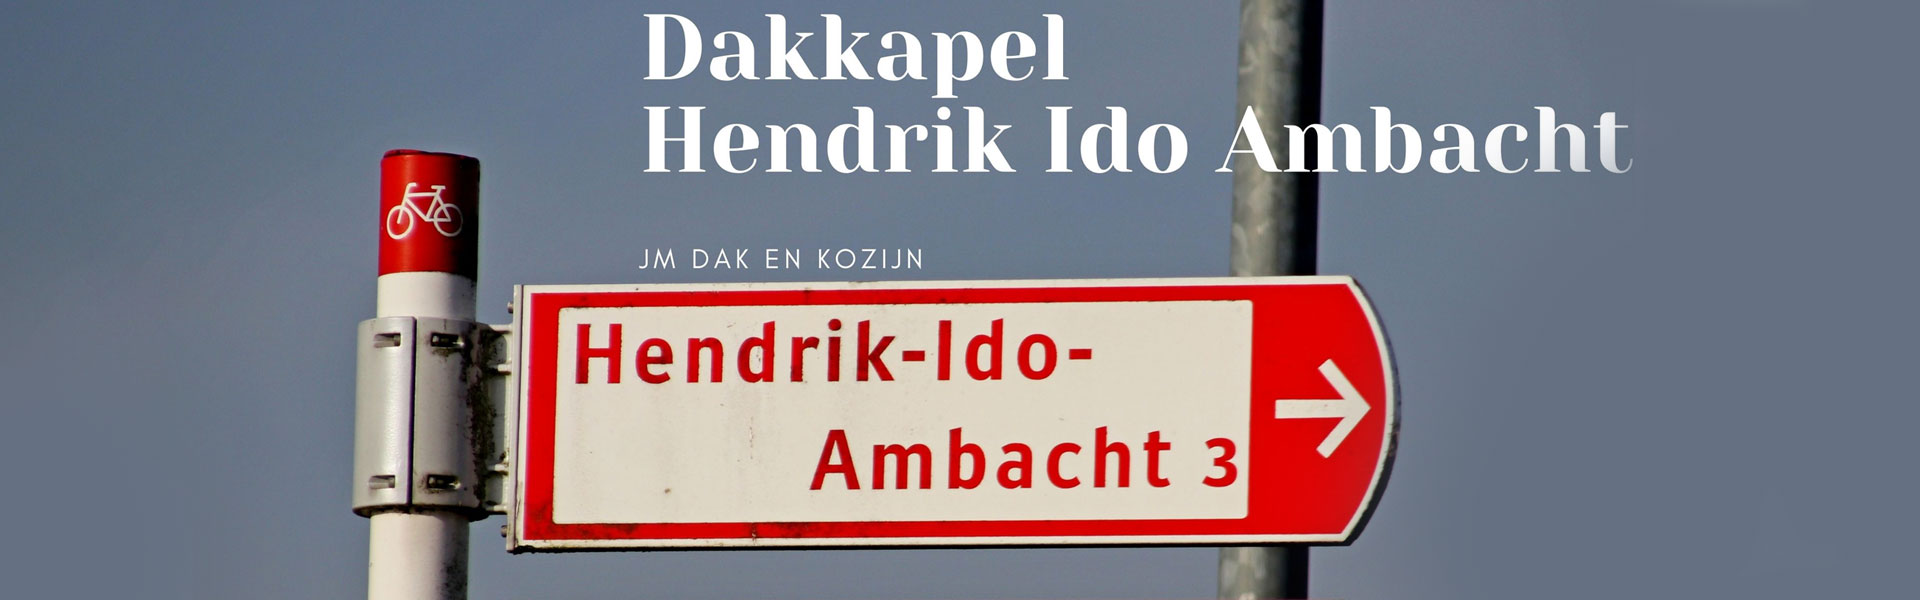 Dakkapel-hendrik-ido-ambacht